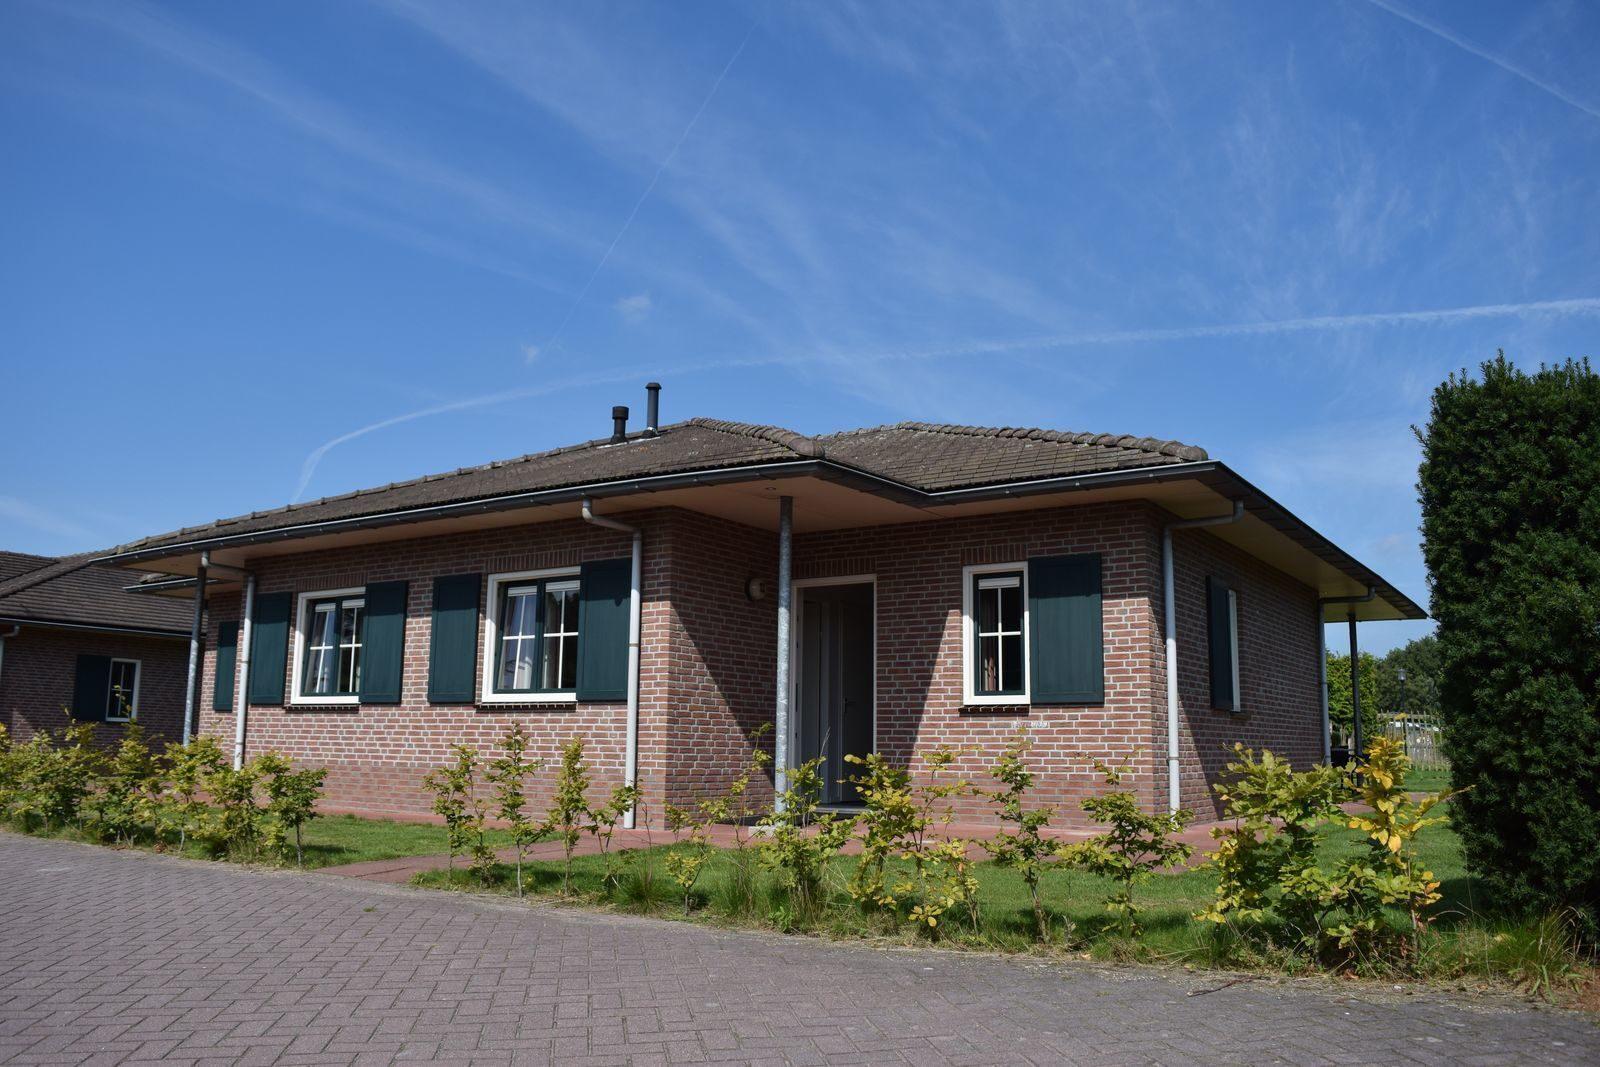 16-person bungalow